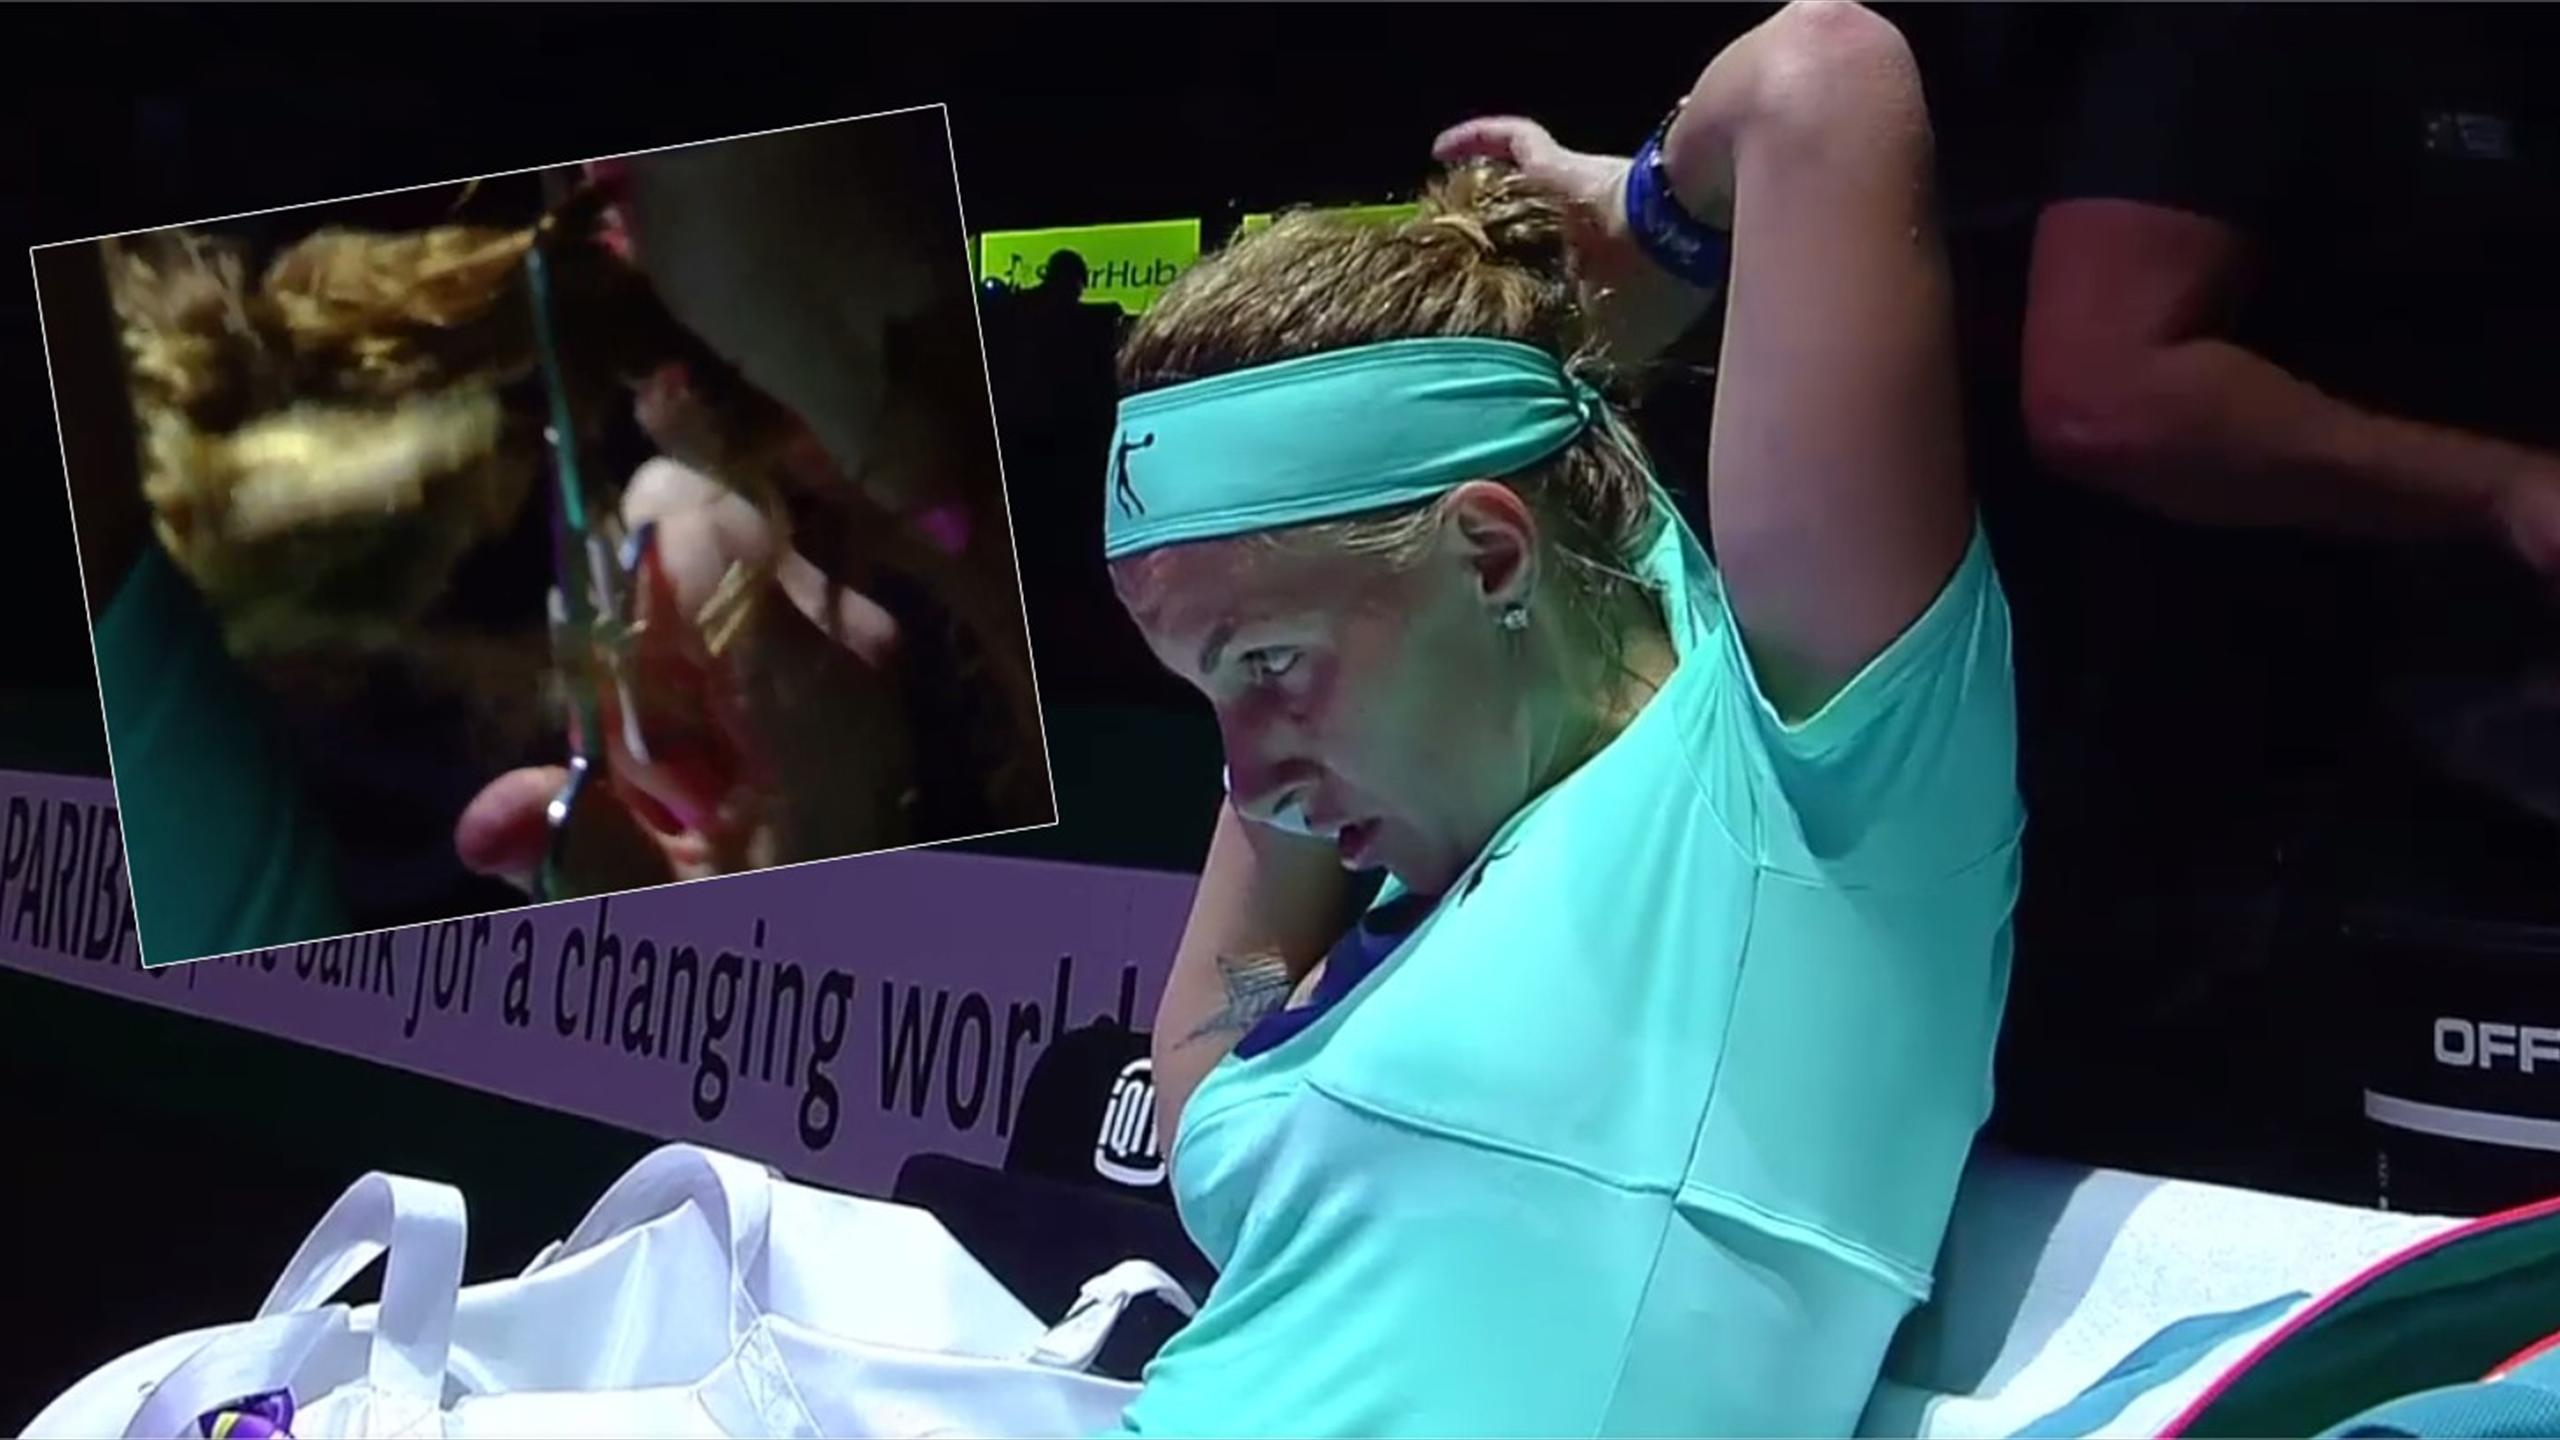 Svetlana Kuznetsova cuts her hair DURING match (WTA on Twitter)